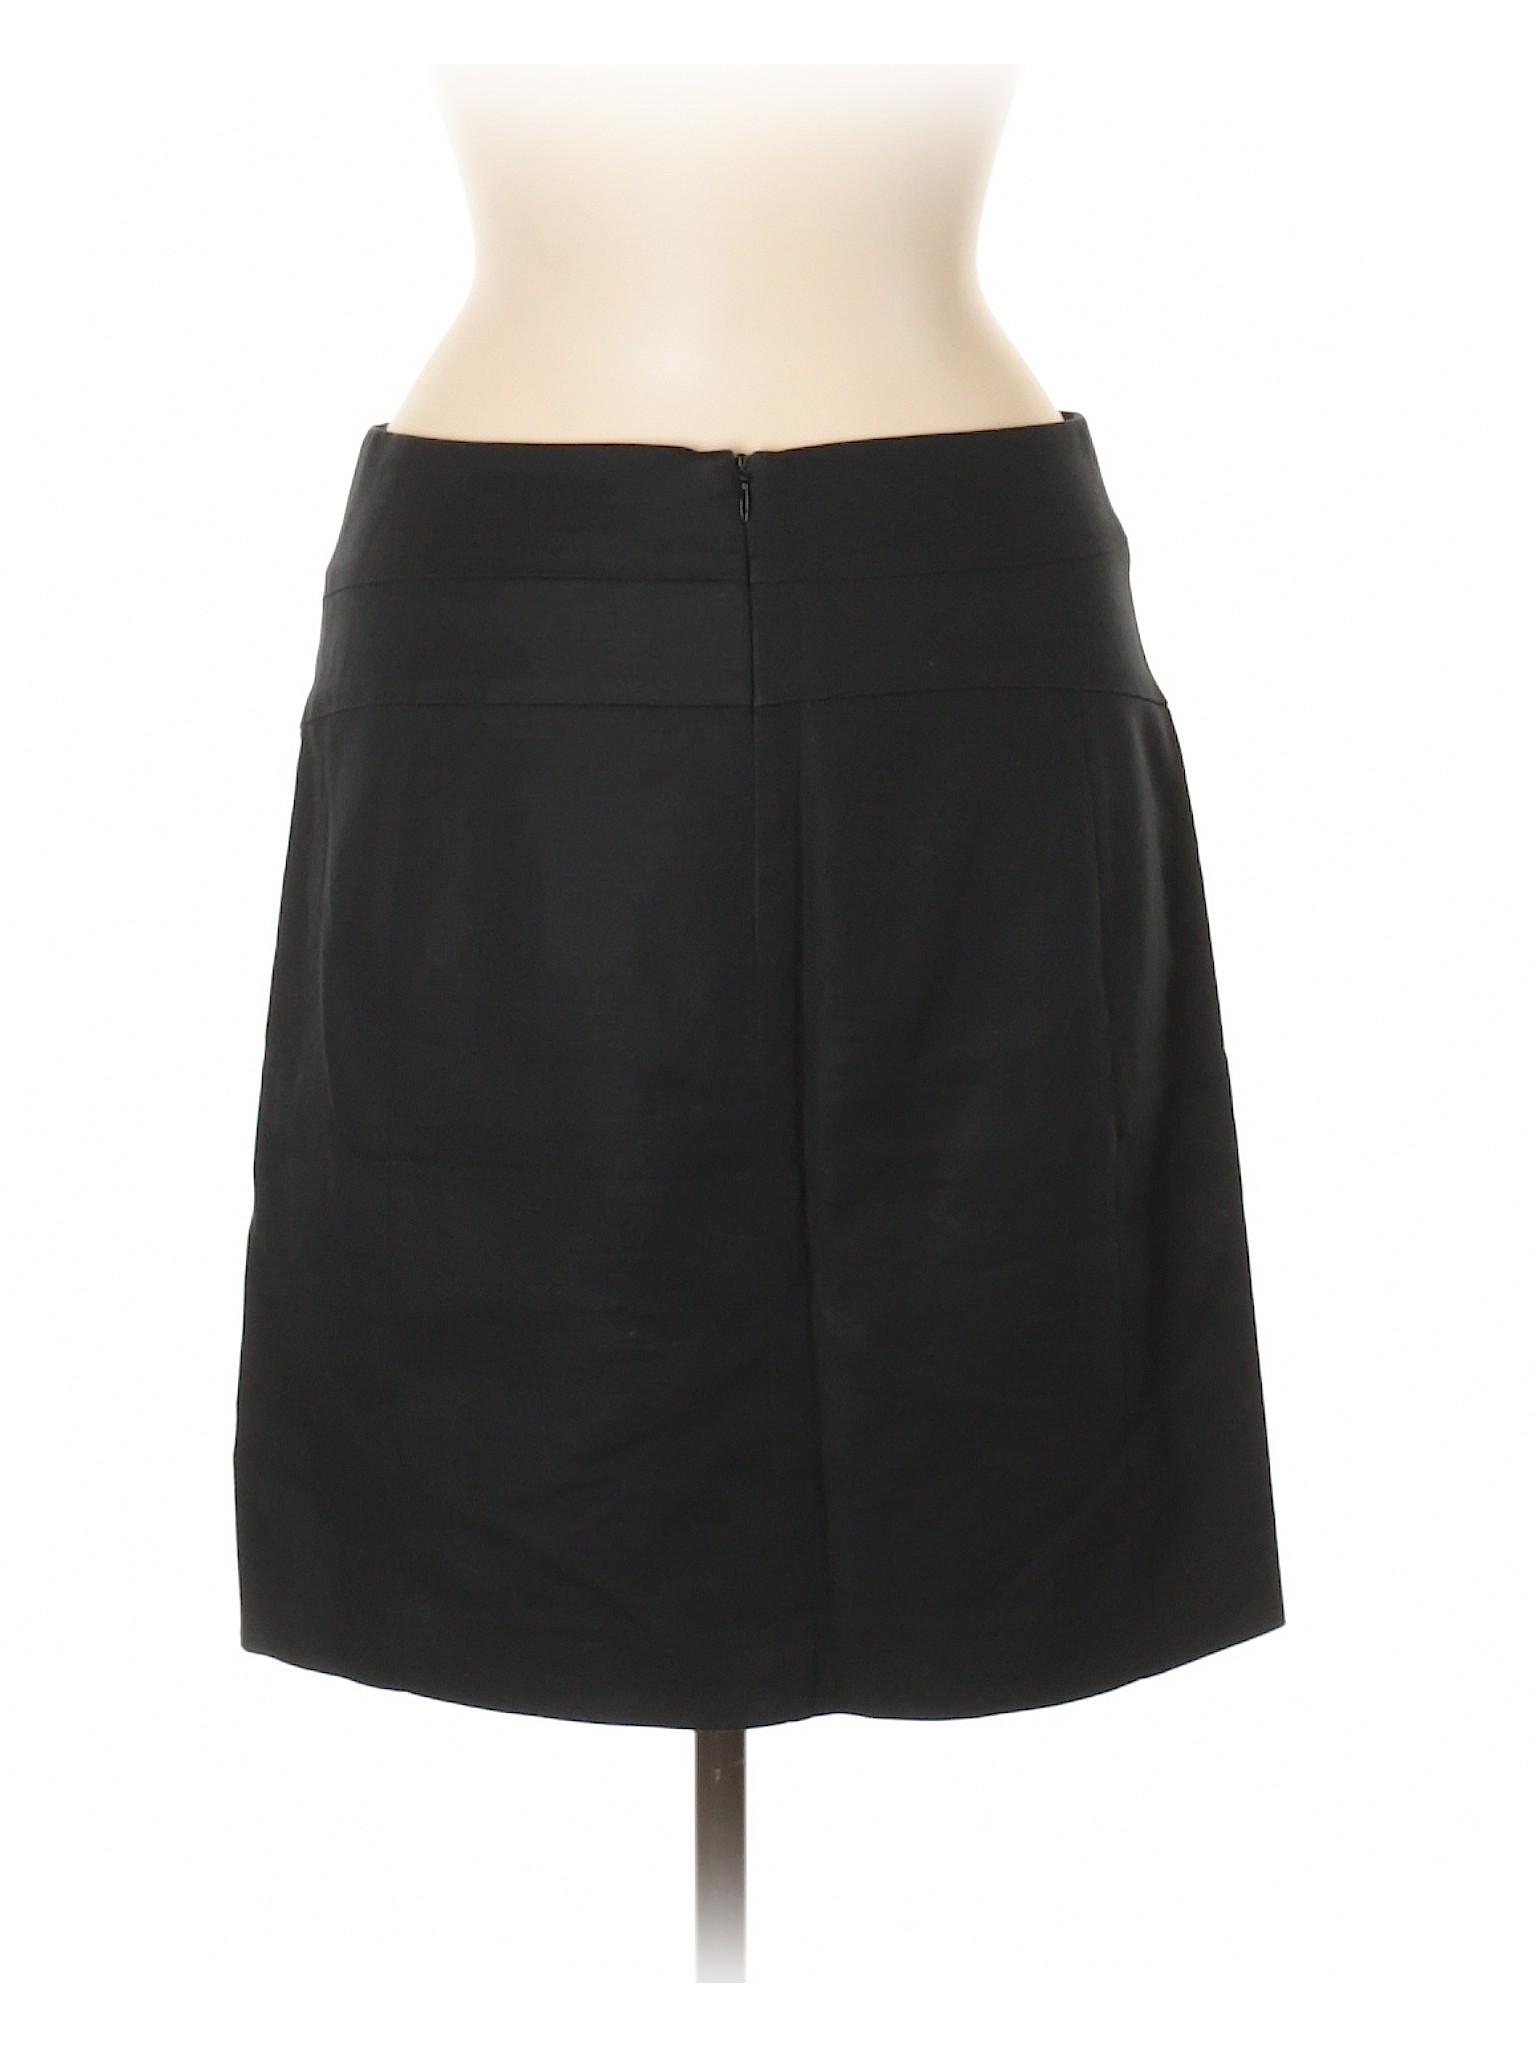 Skirt Casual Skirt Casual Boutique Casual Casual Boutique Skirt Boutique Skirt Boutique Skirt Casual Boutique Boutique nRxqAXS